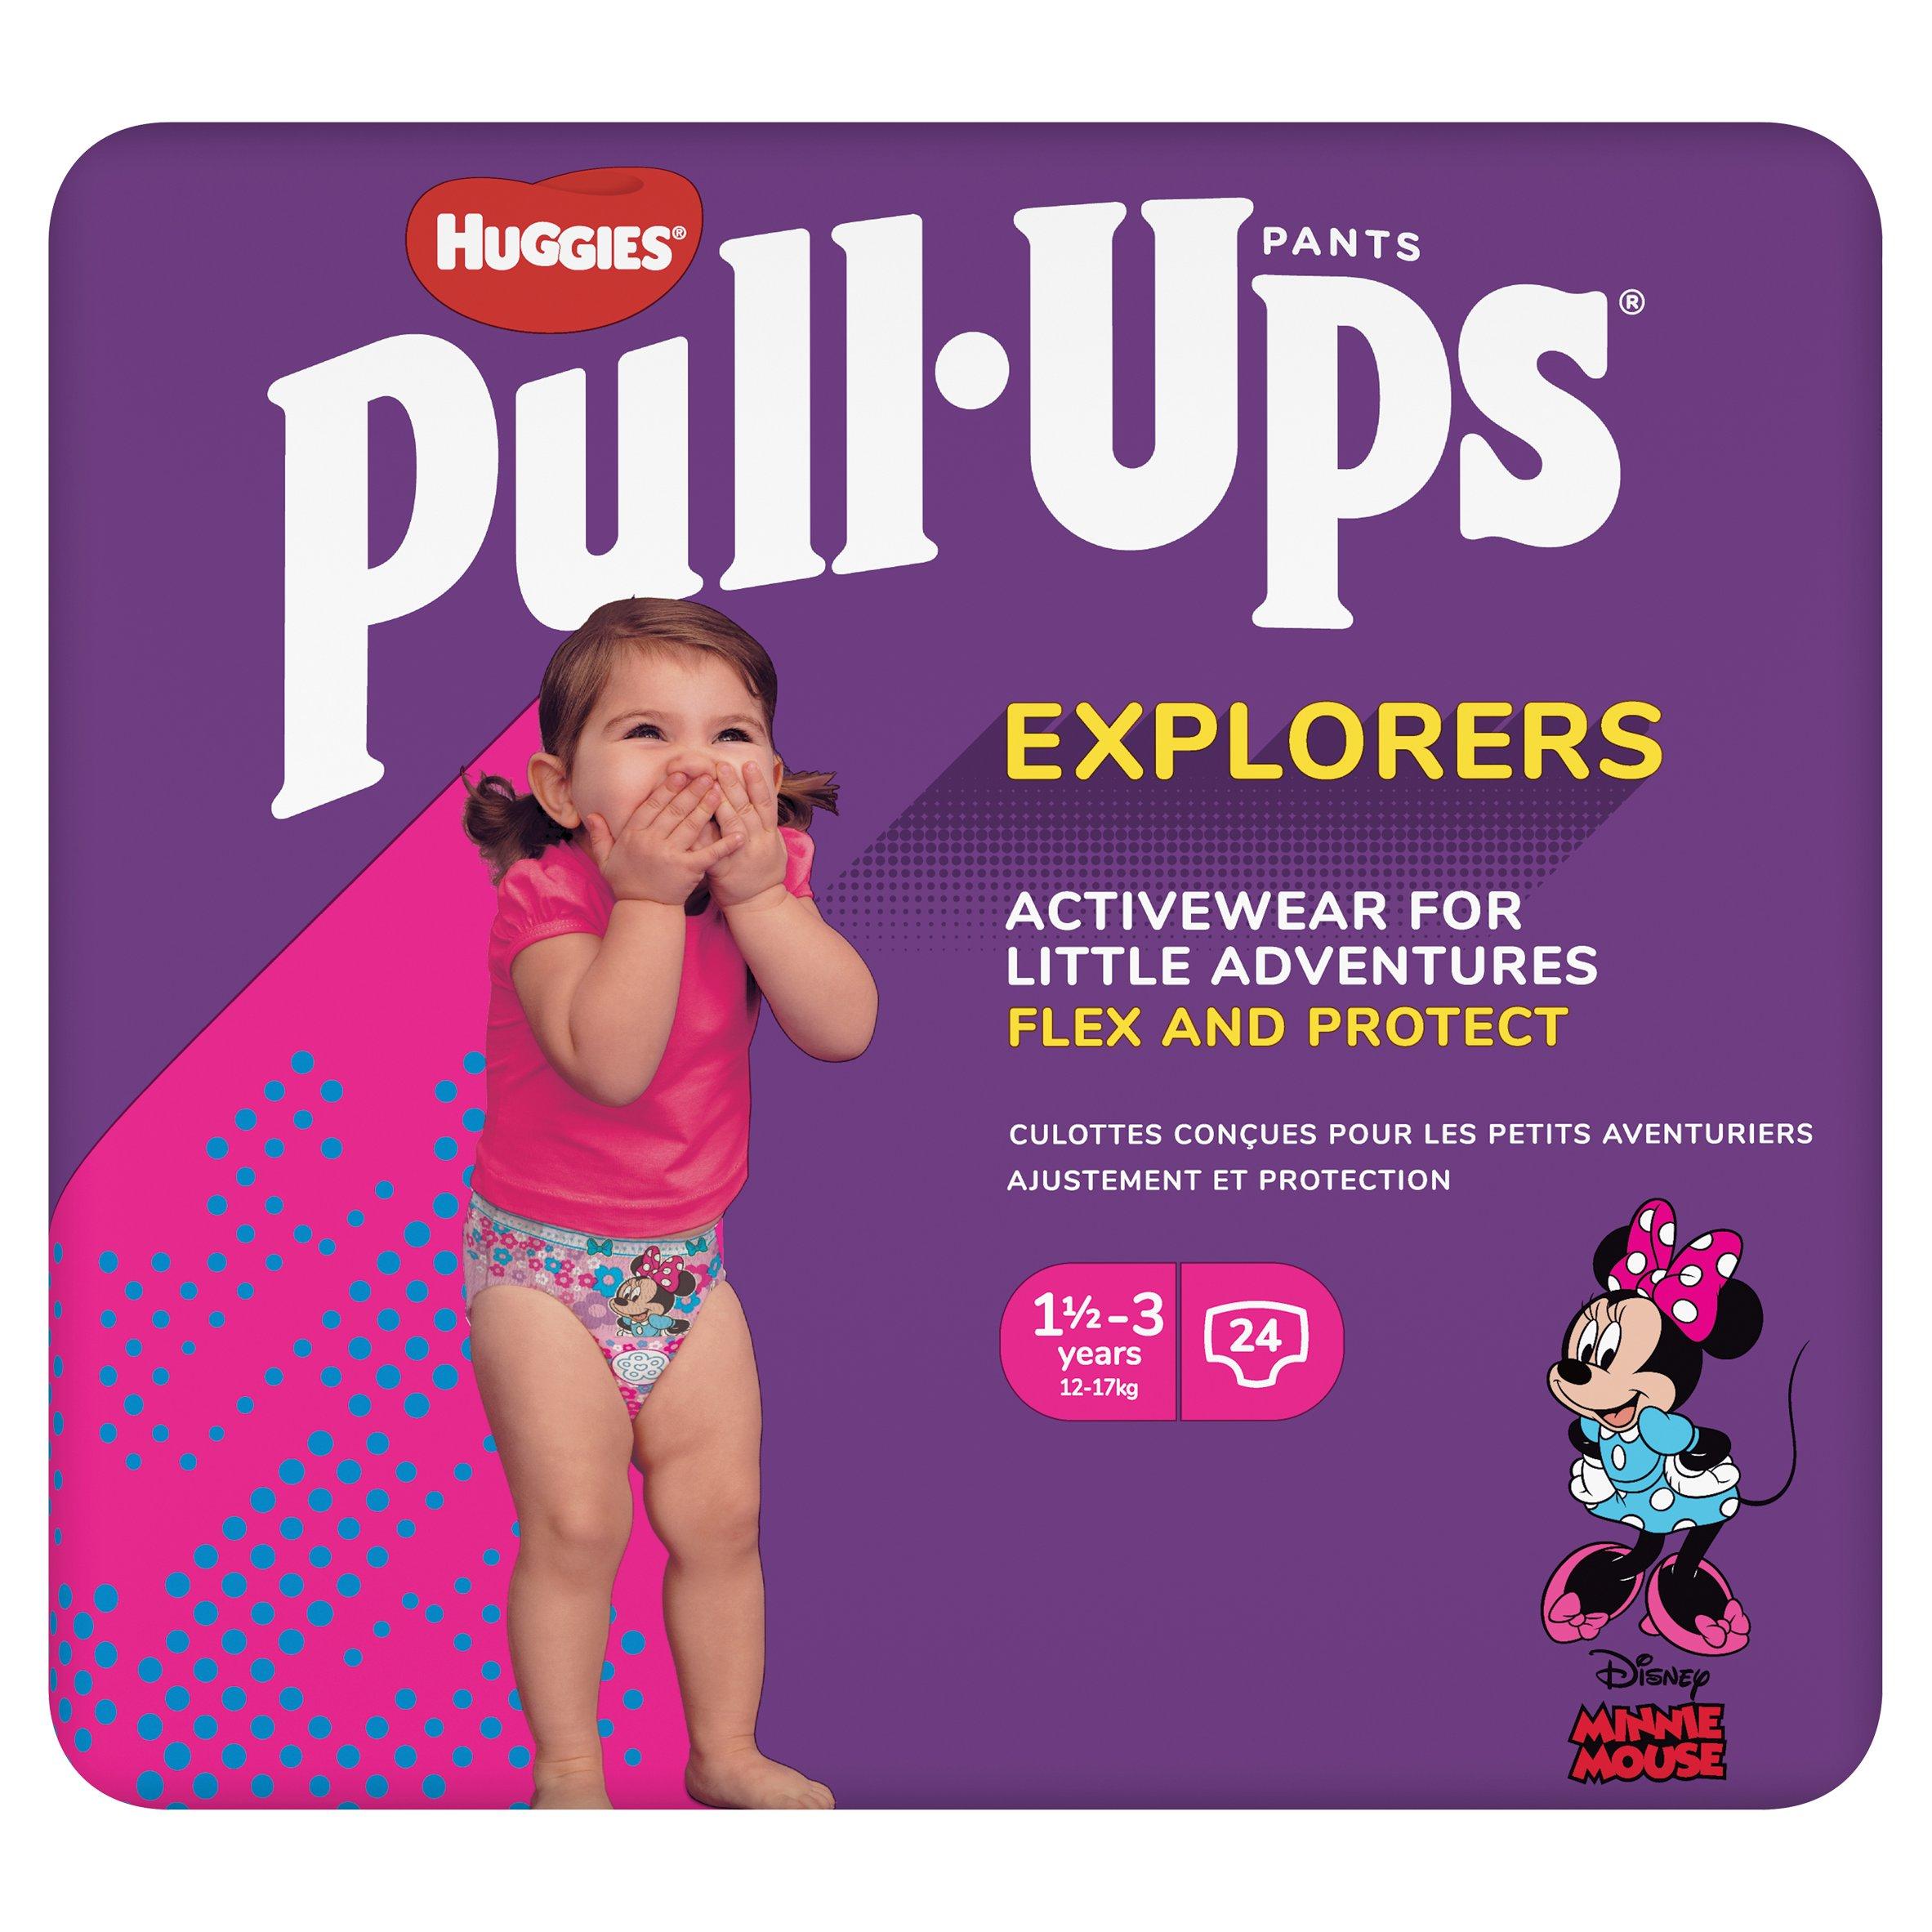 Huggies Pull Ups Explorers 1.5-3 Years Pink 24 Pack